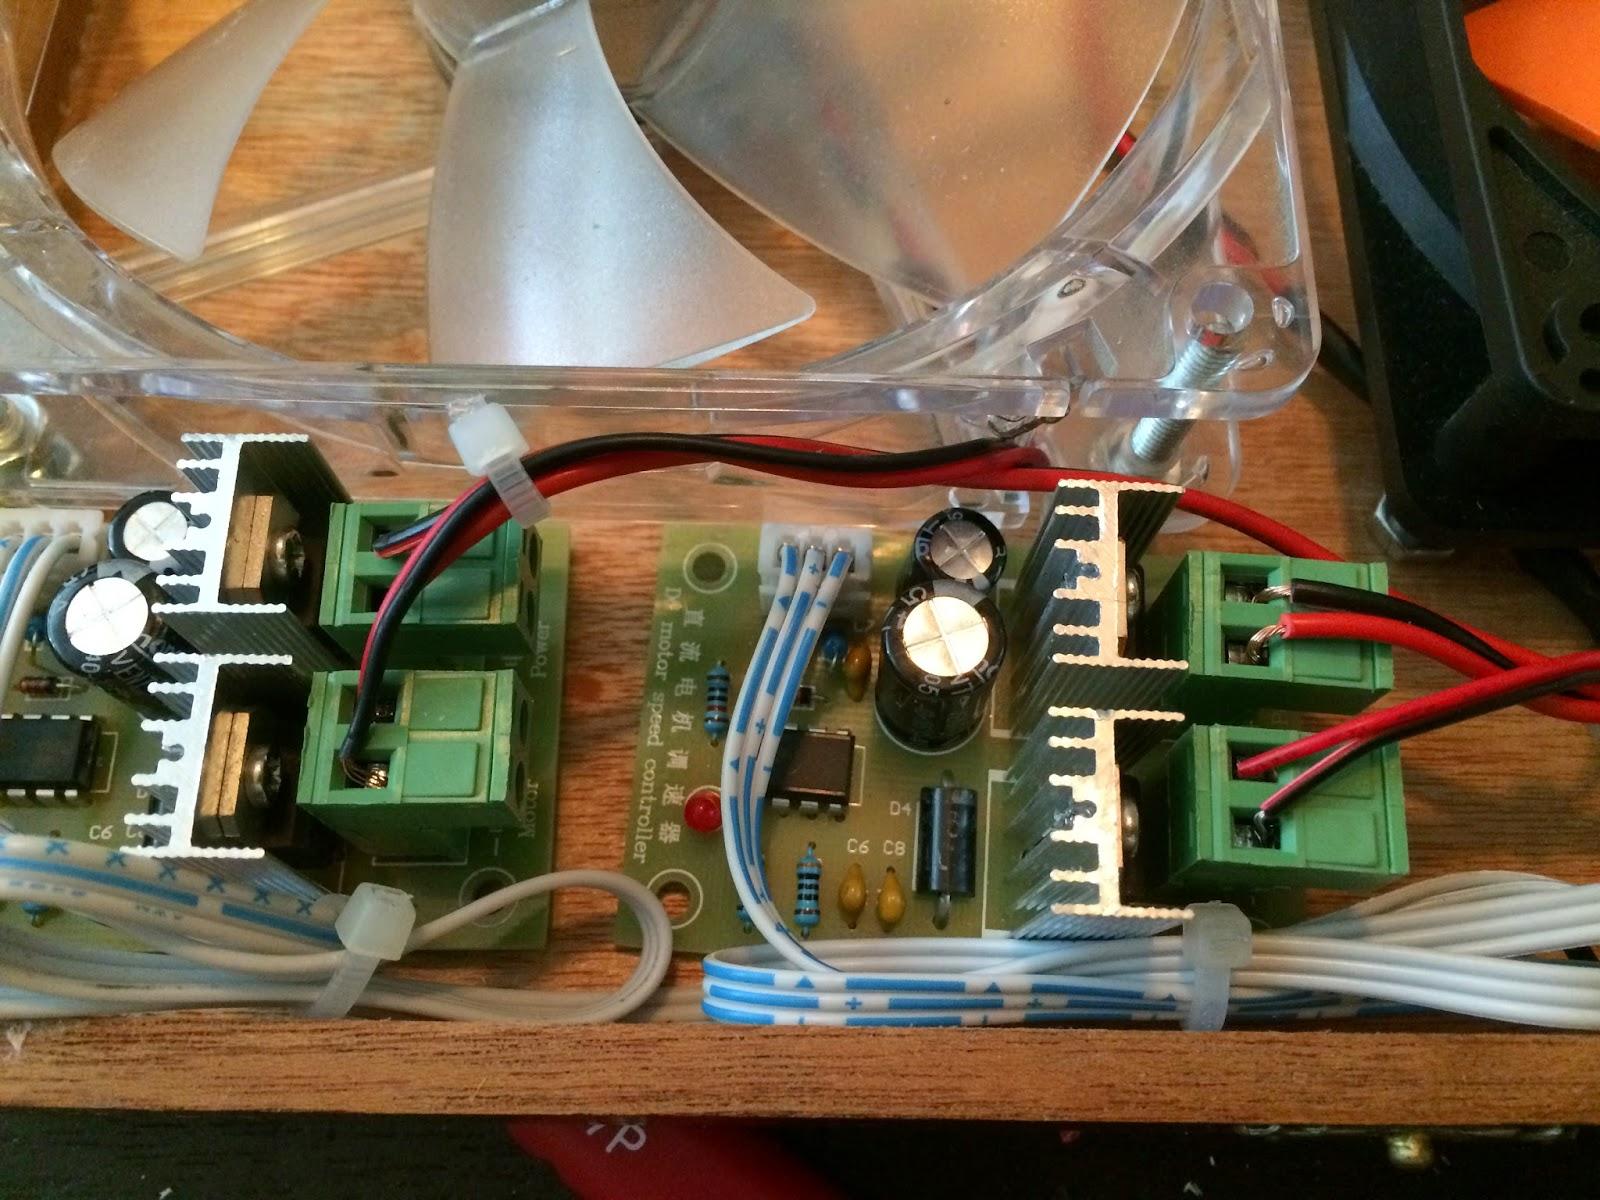 diy stir plate wiring diagram nissan 350z headlight rheostat pot question home brew forums